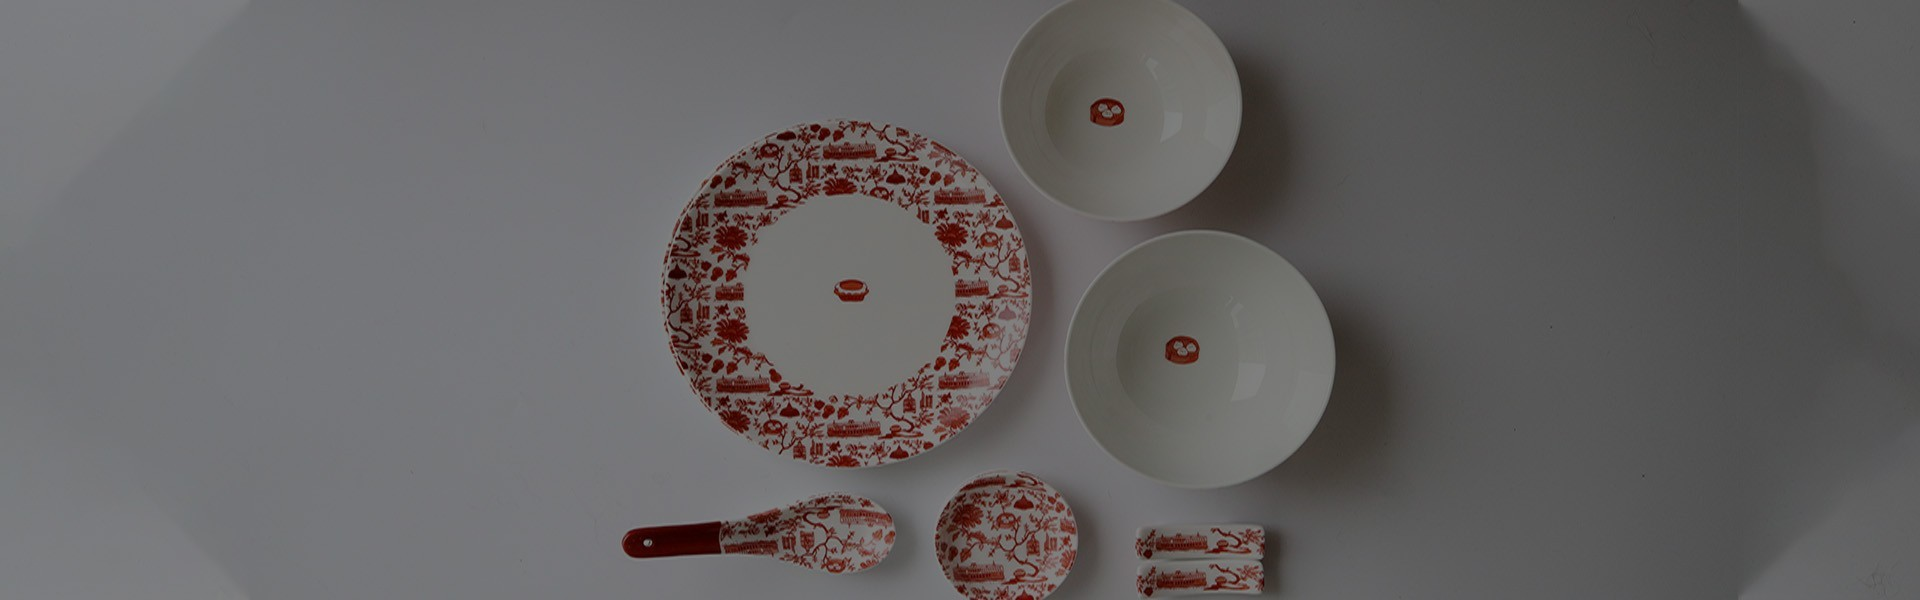 Chinese Dining Set